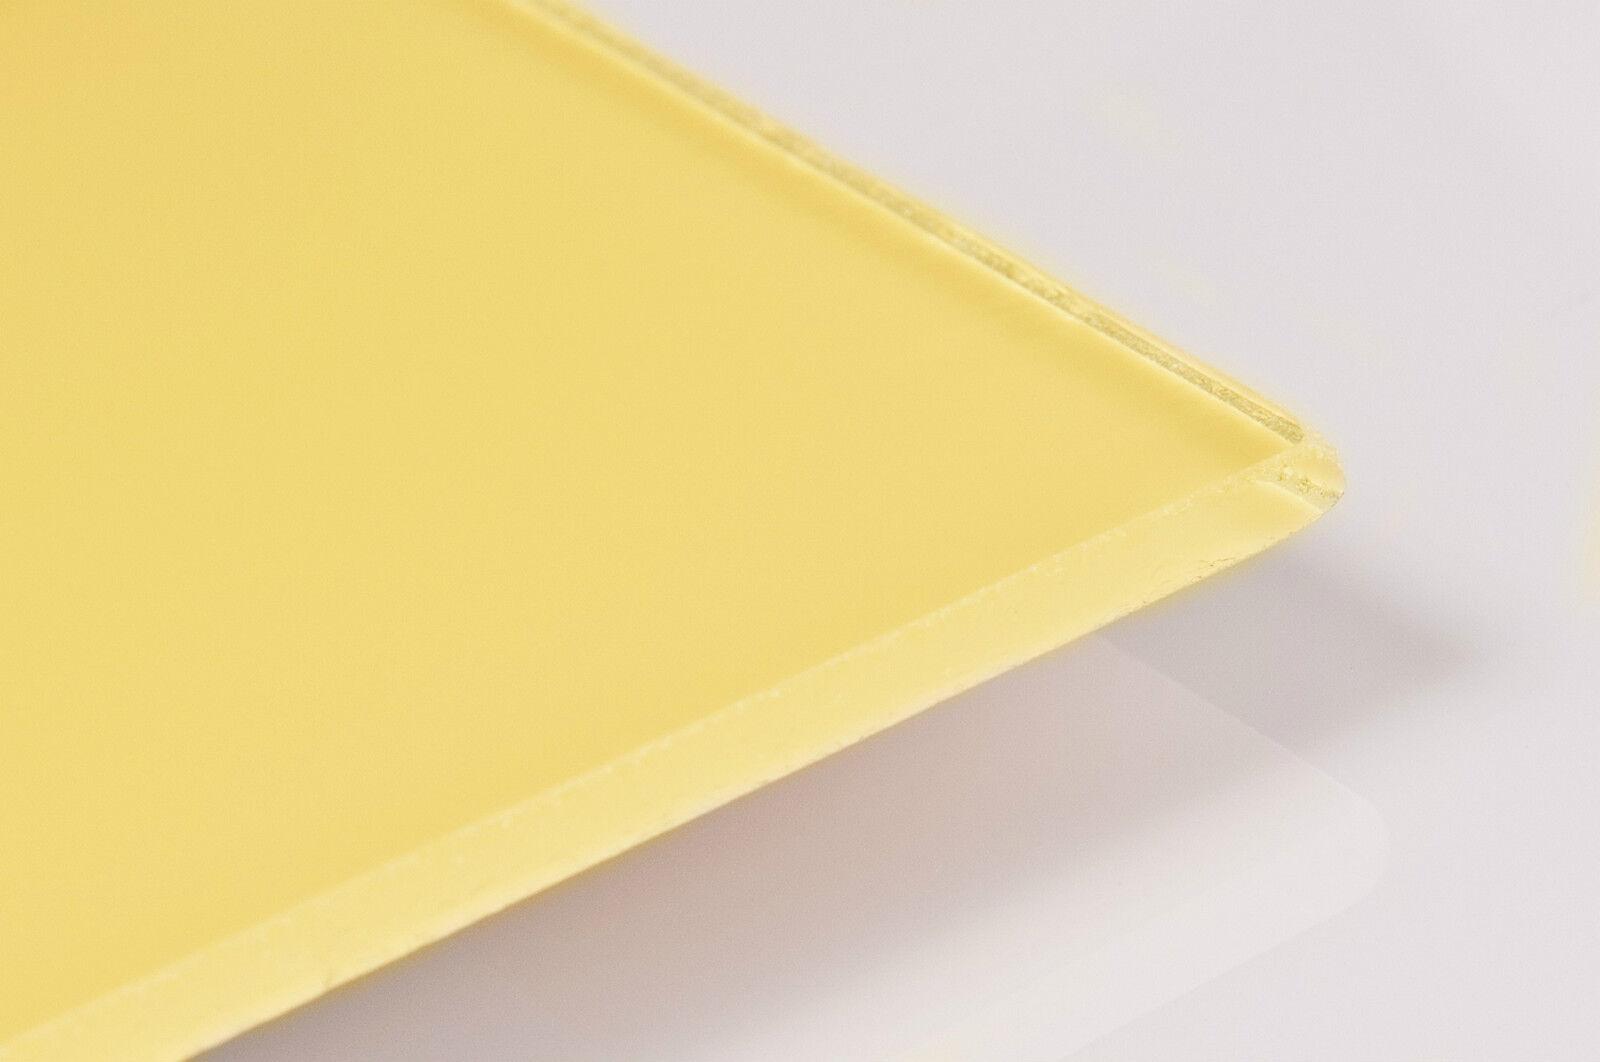 esg k chenr ckwand fliesenspiegel glas 6mm farbig lackiert. Black Bedroom Furniture Sets. Home Design Ideas